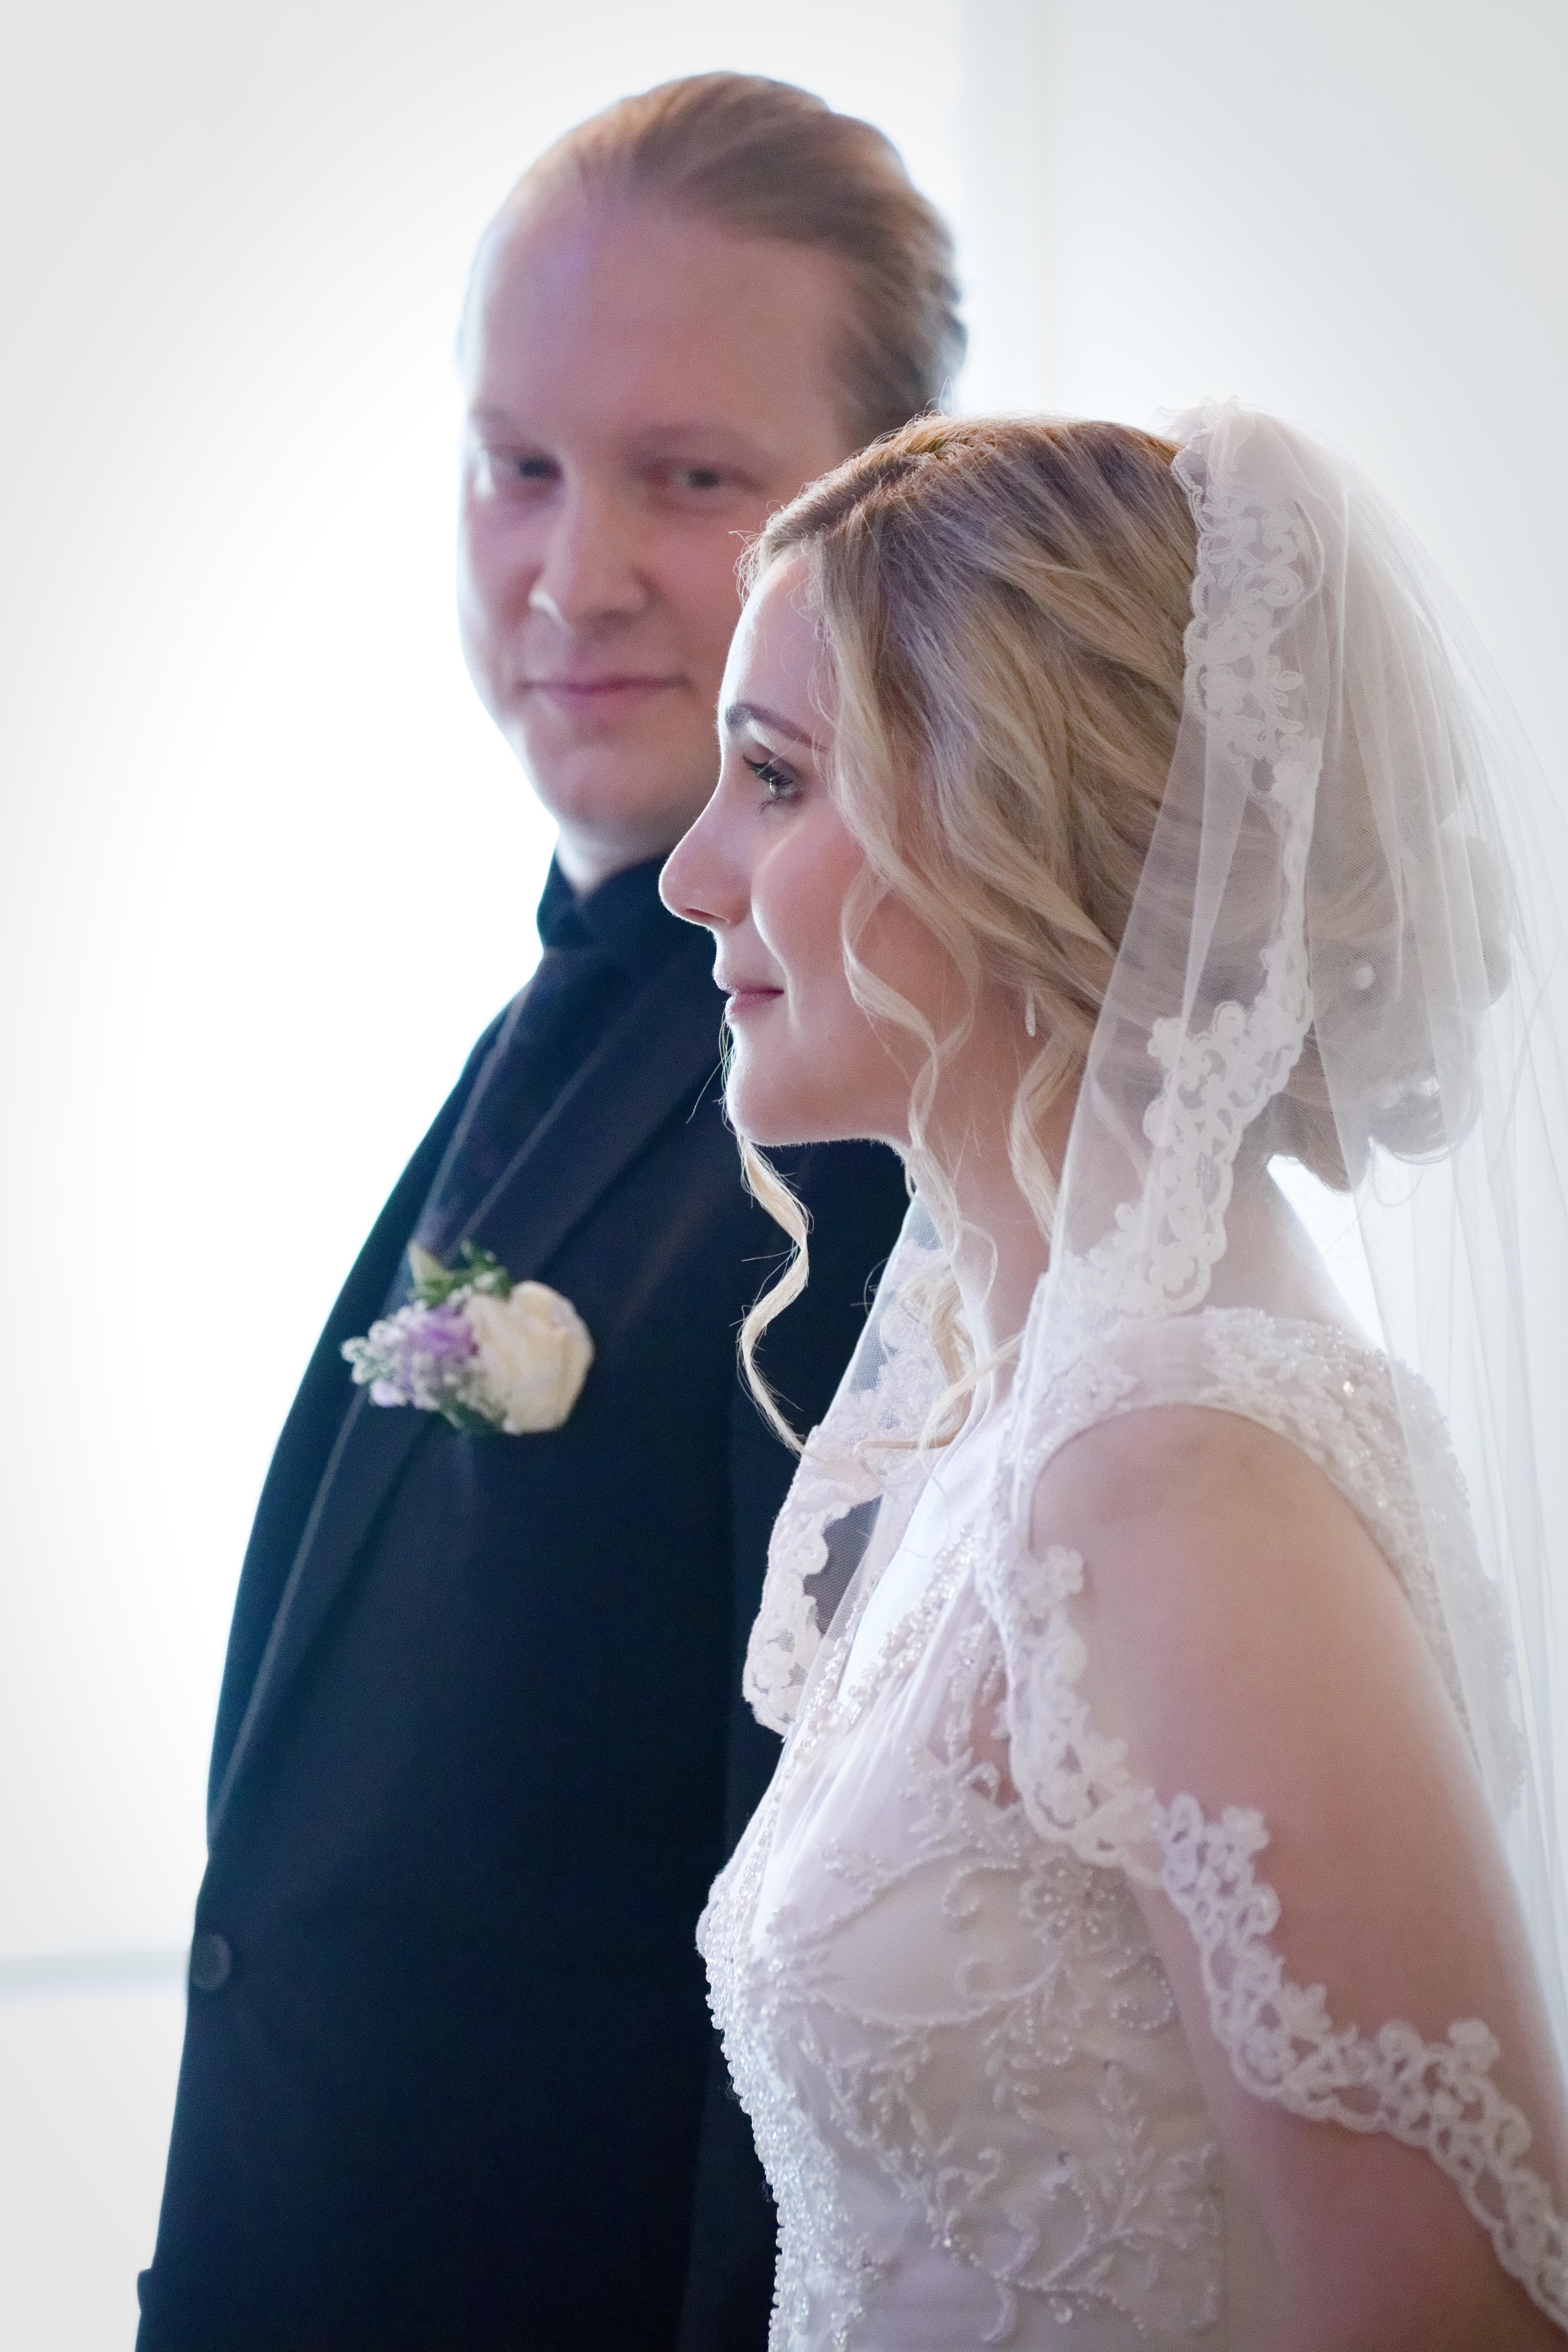 Bröllopsceremoni 5 - nygifta